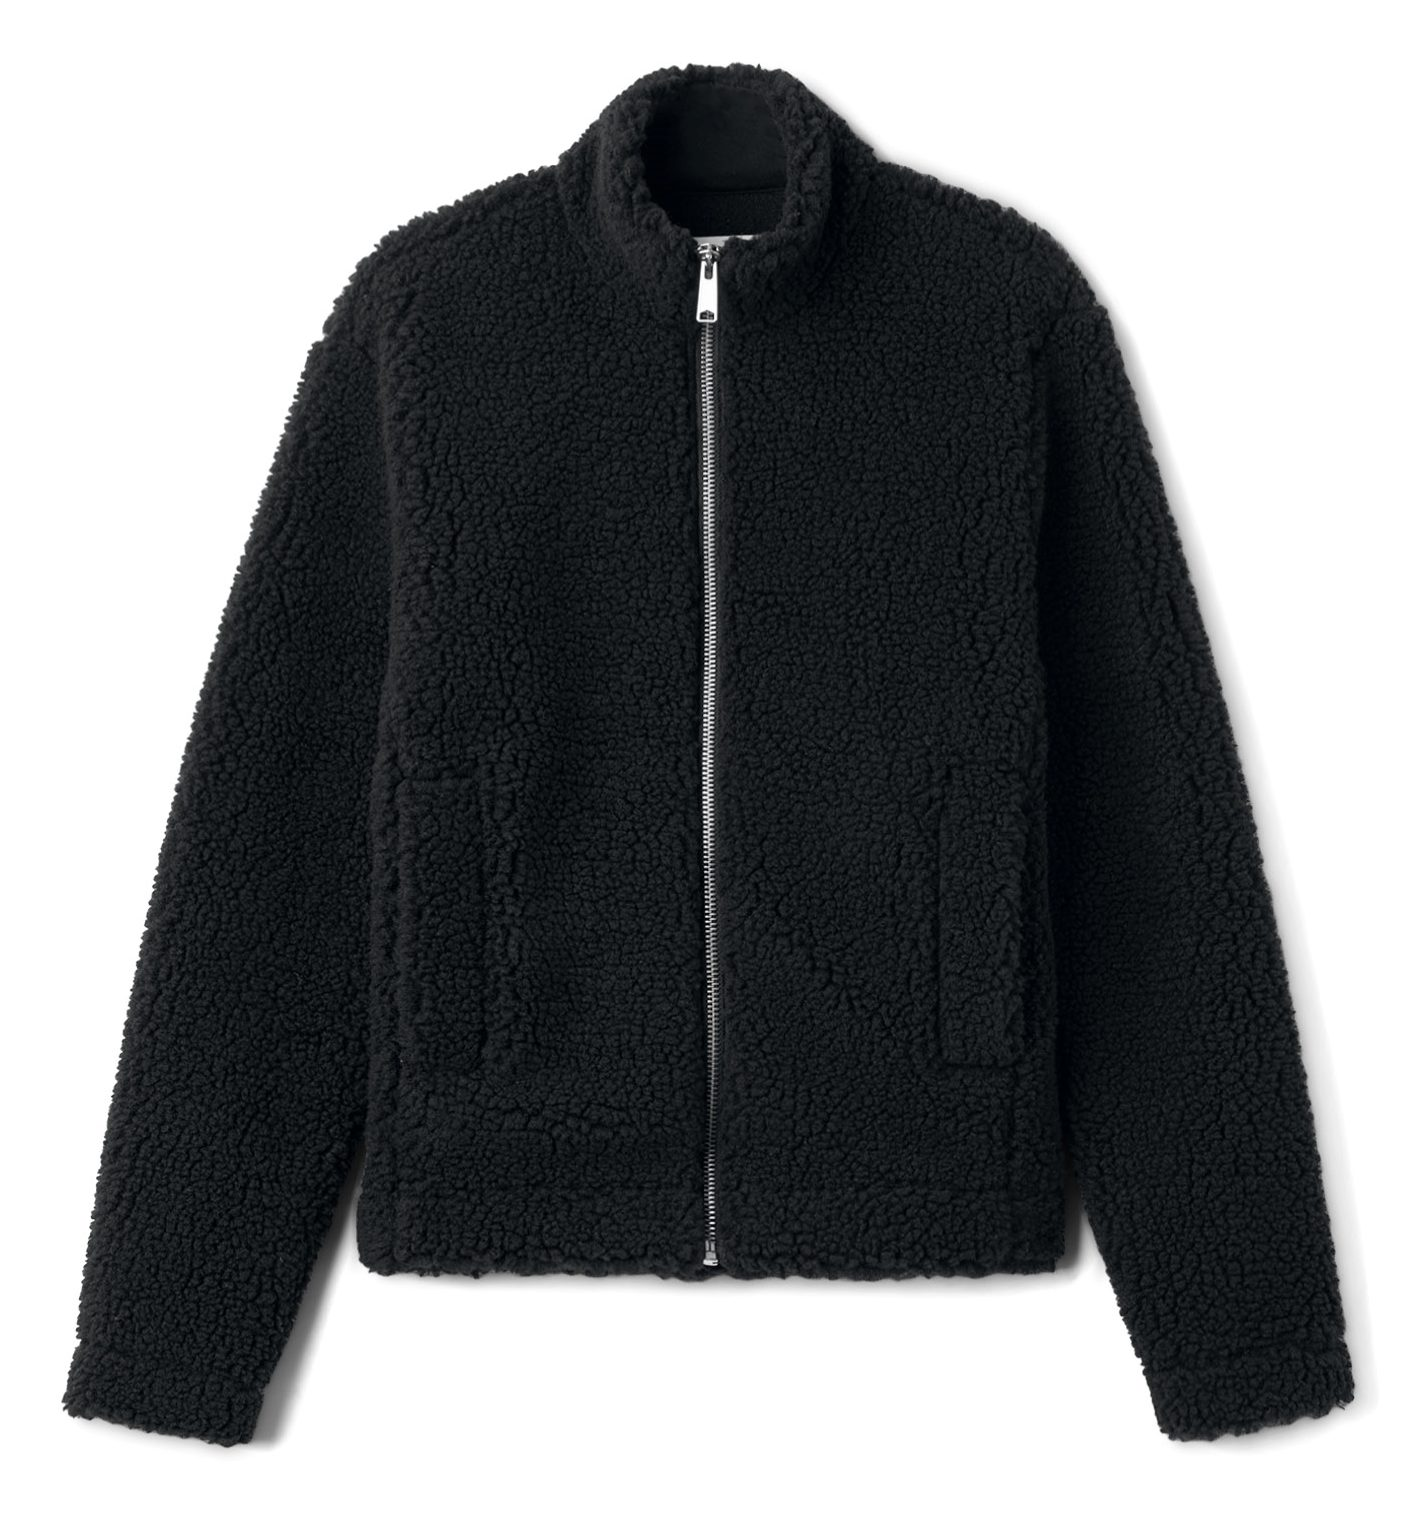 Weekday Wes Zip Sweater